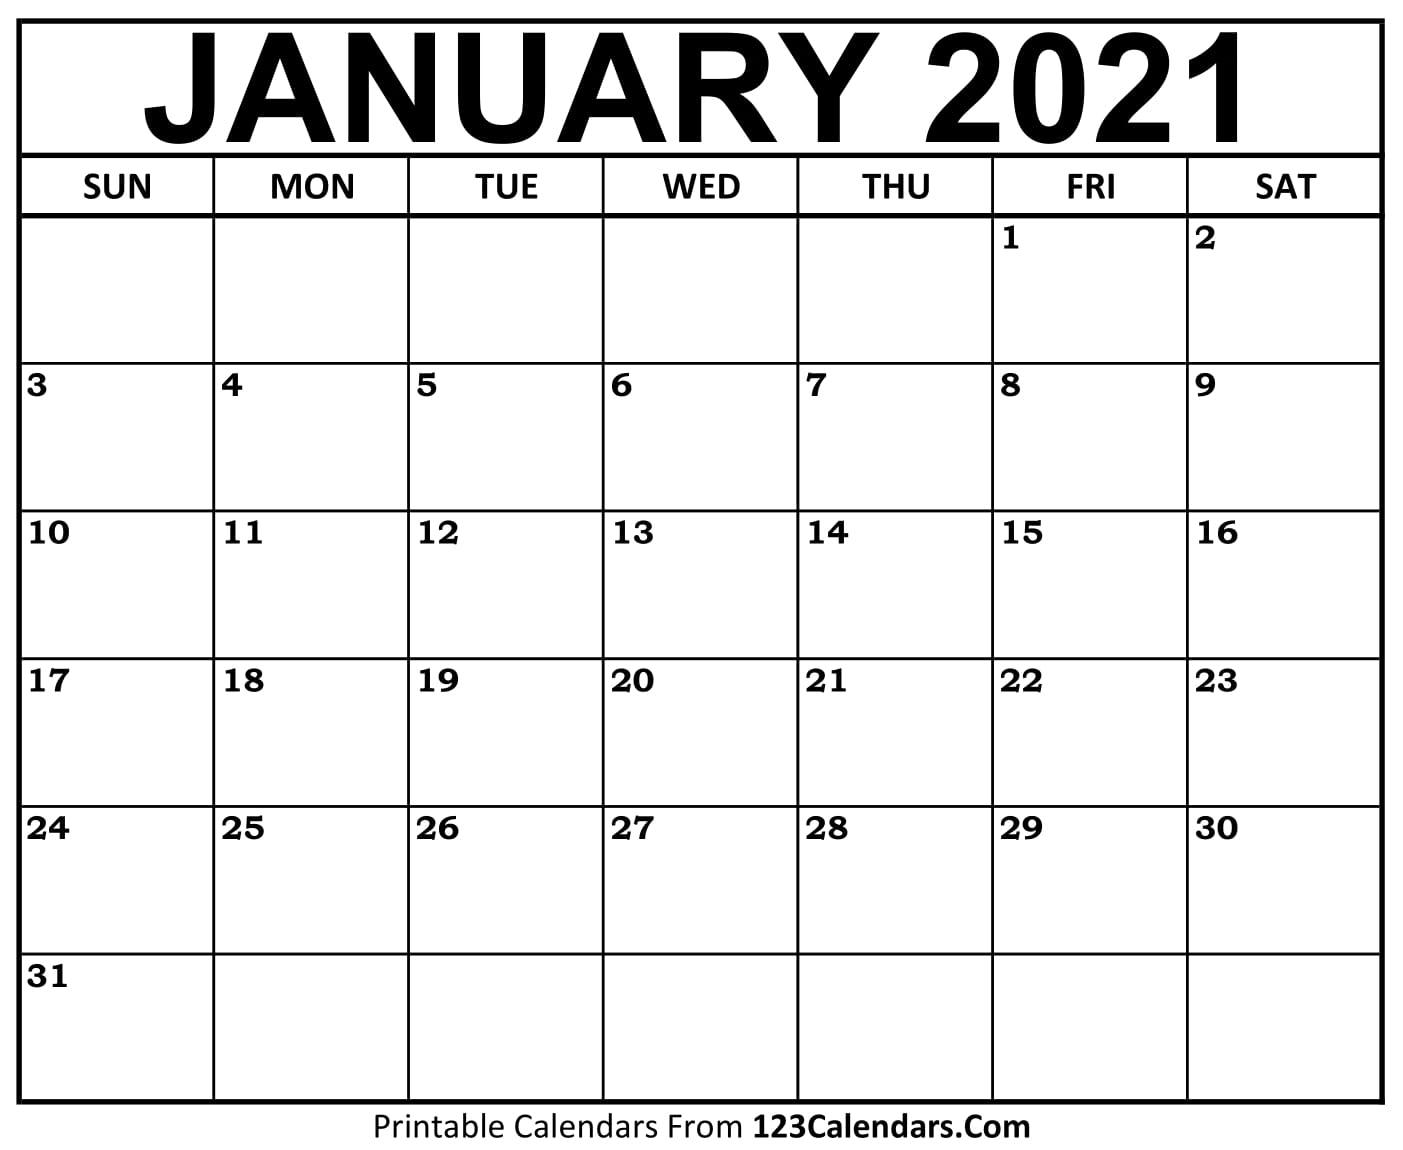 2021 Printable Calendar | 123Calendars for Calendar November December January Space To Write At The Side